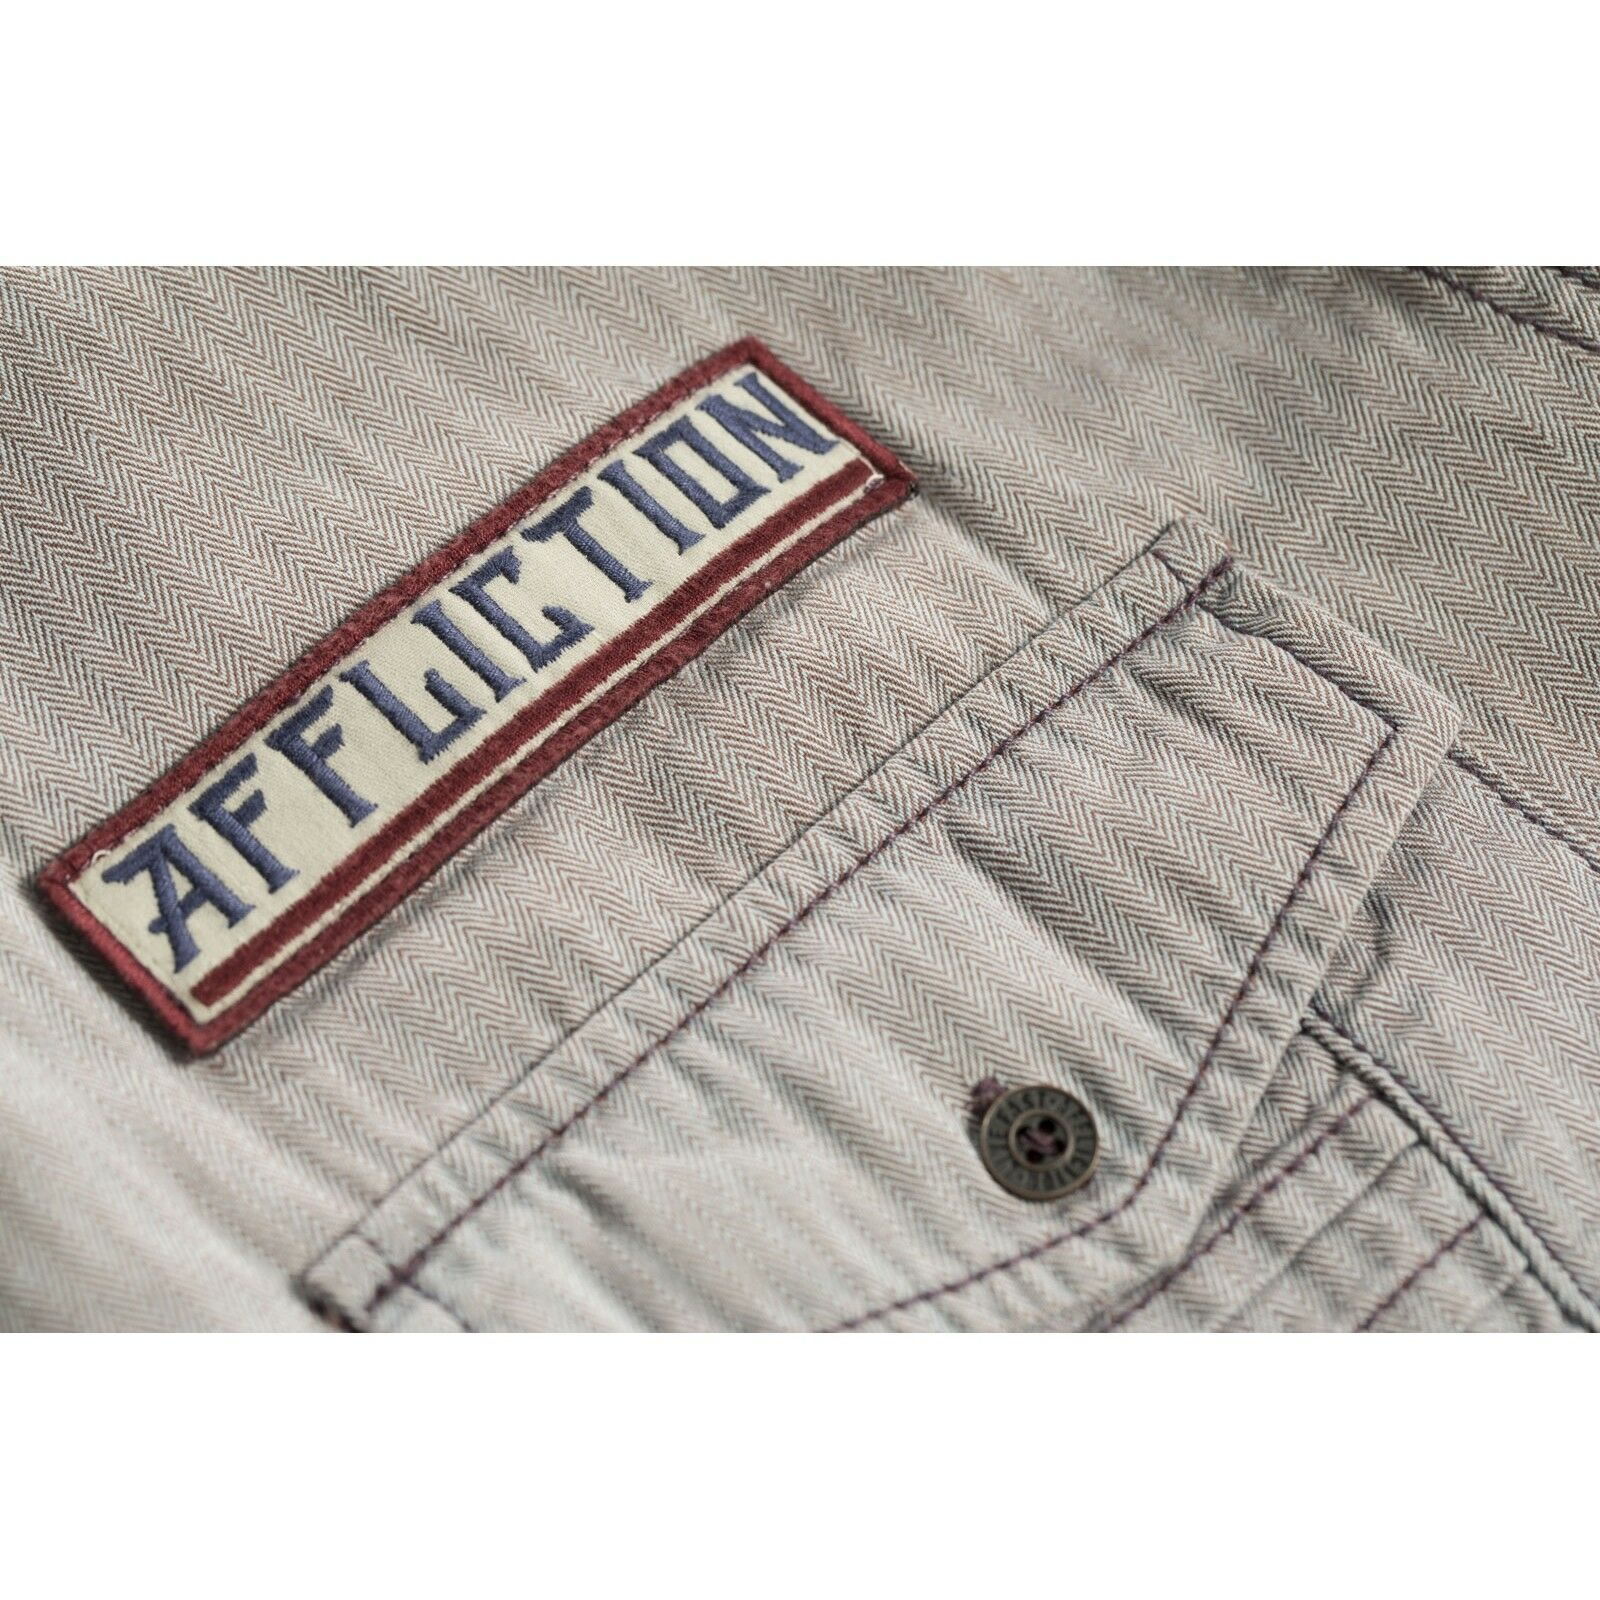 AFFLICTION Hemd Tribbett Grau Hemden | Fein Verarbeitet  Verarbeitet  Verarbeitet  4849a7